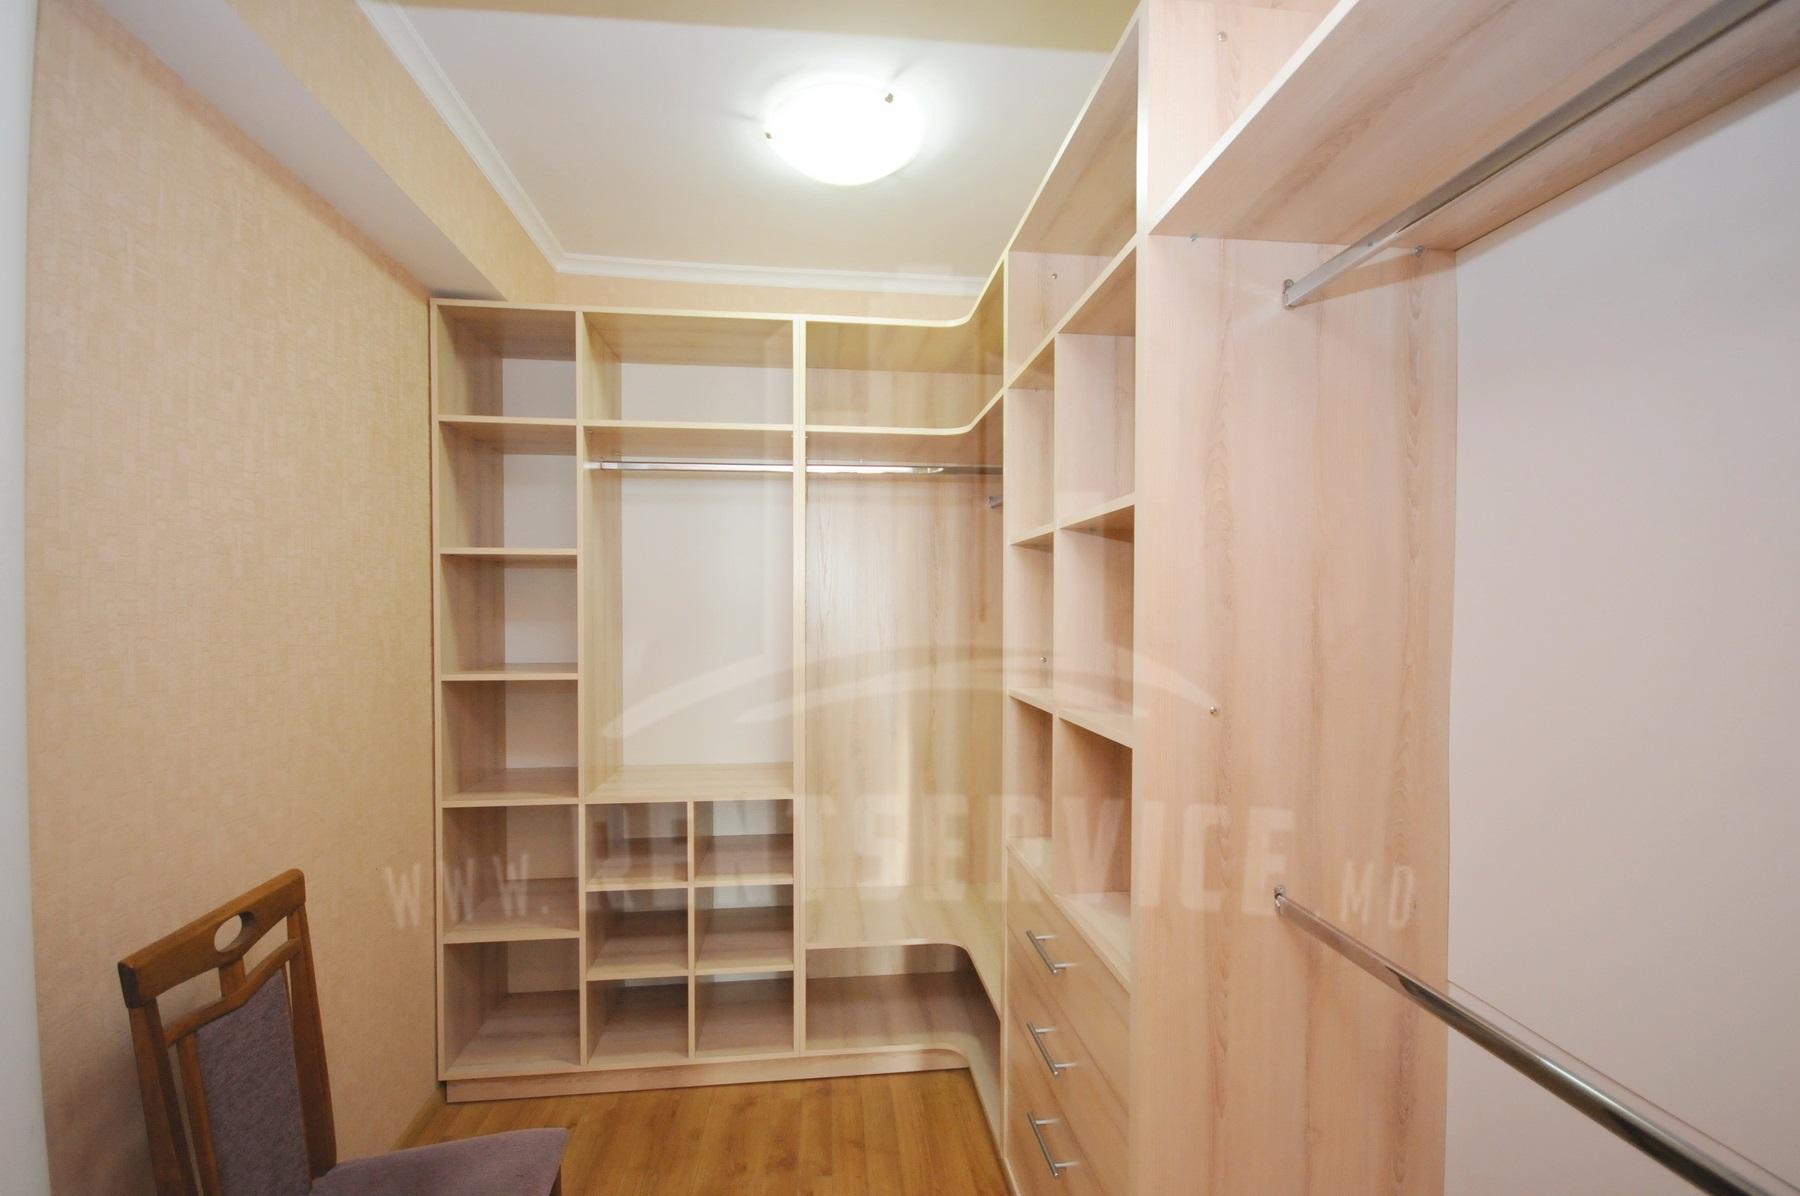 211_apartment_17.JPG